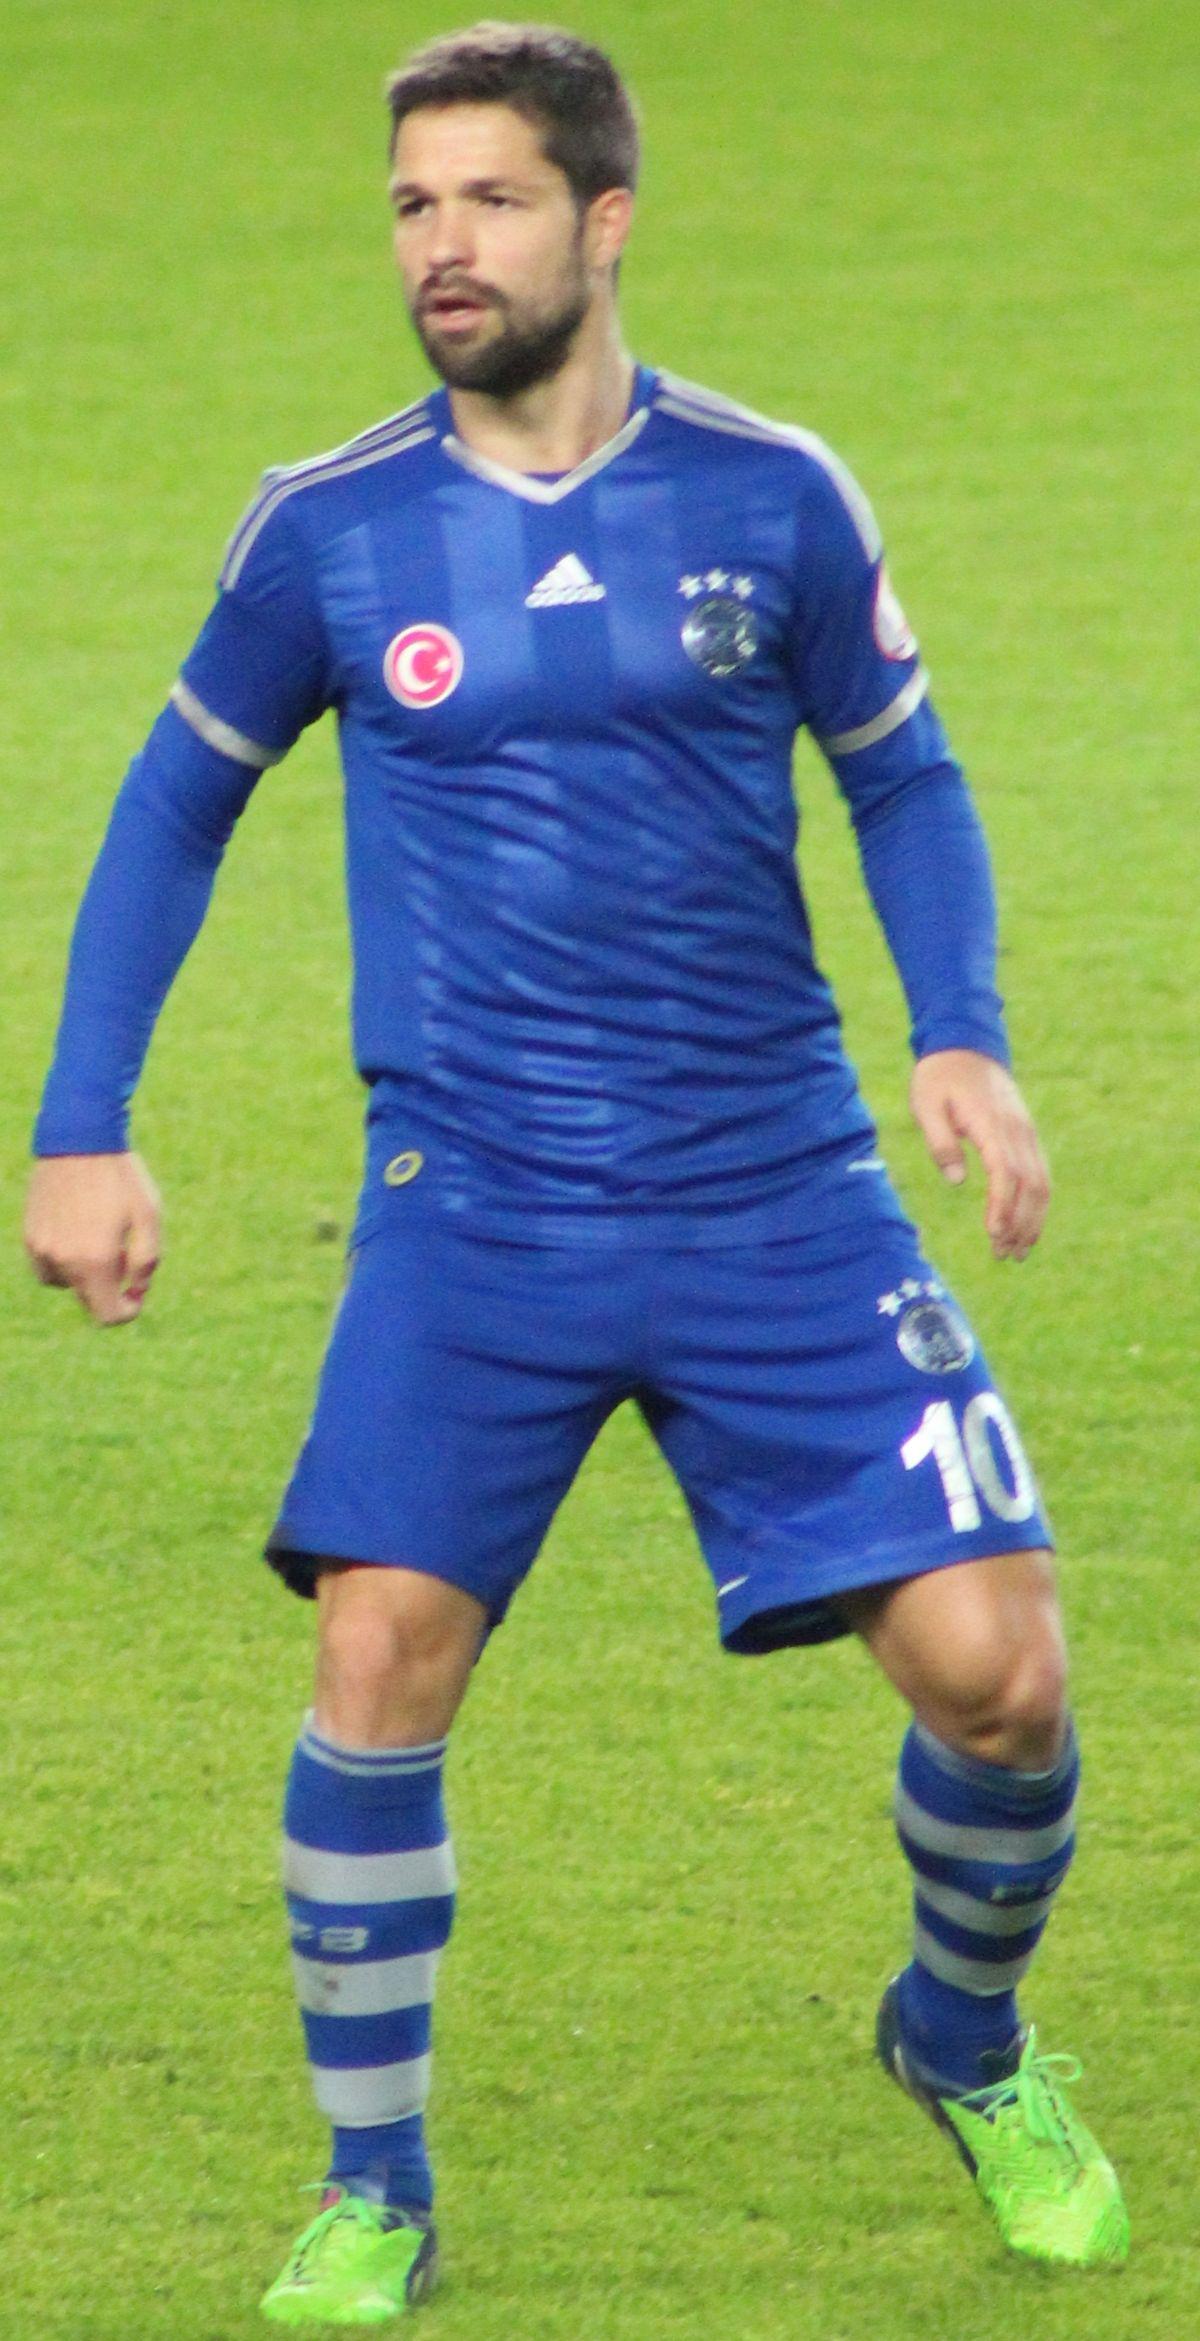 a21c4c13029f1 Diego Ribas da Cunha – Wikipédia